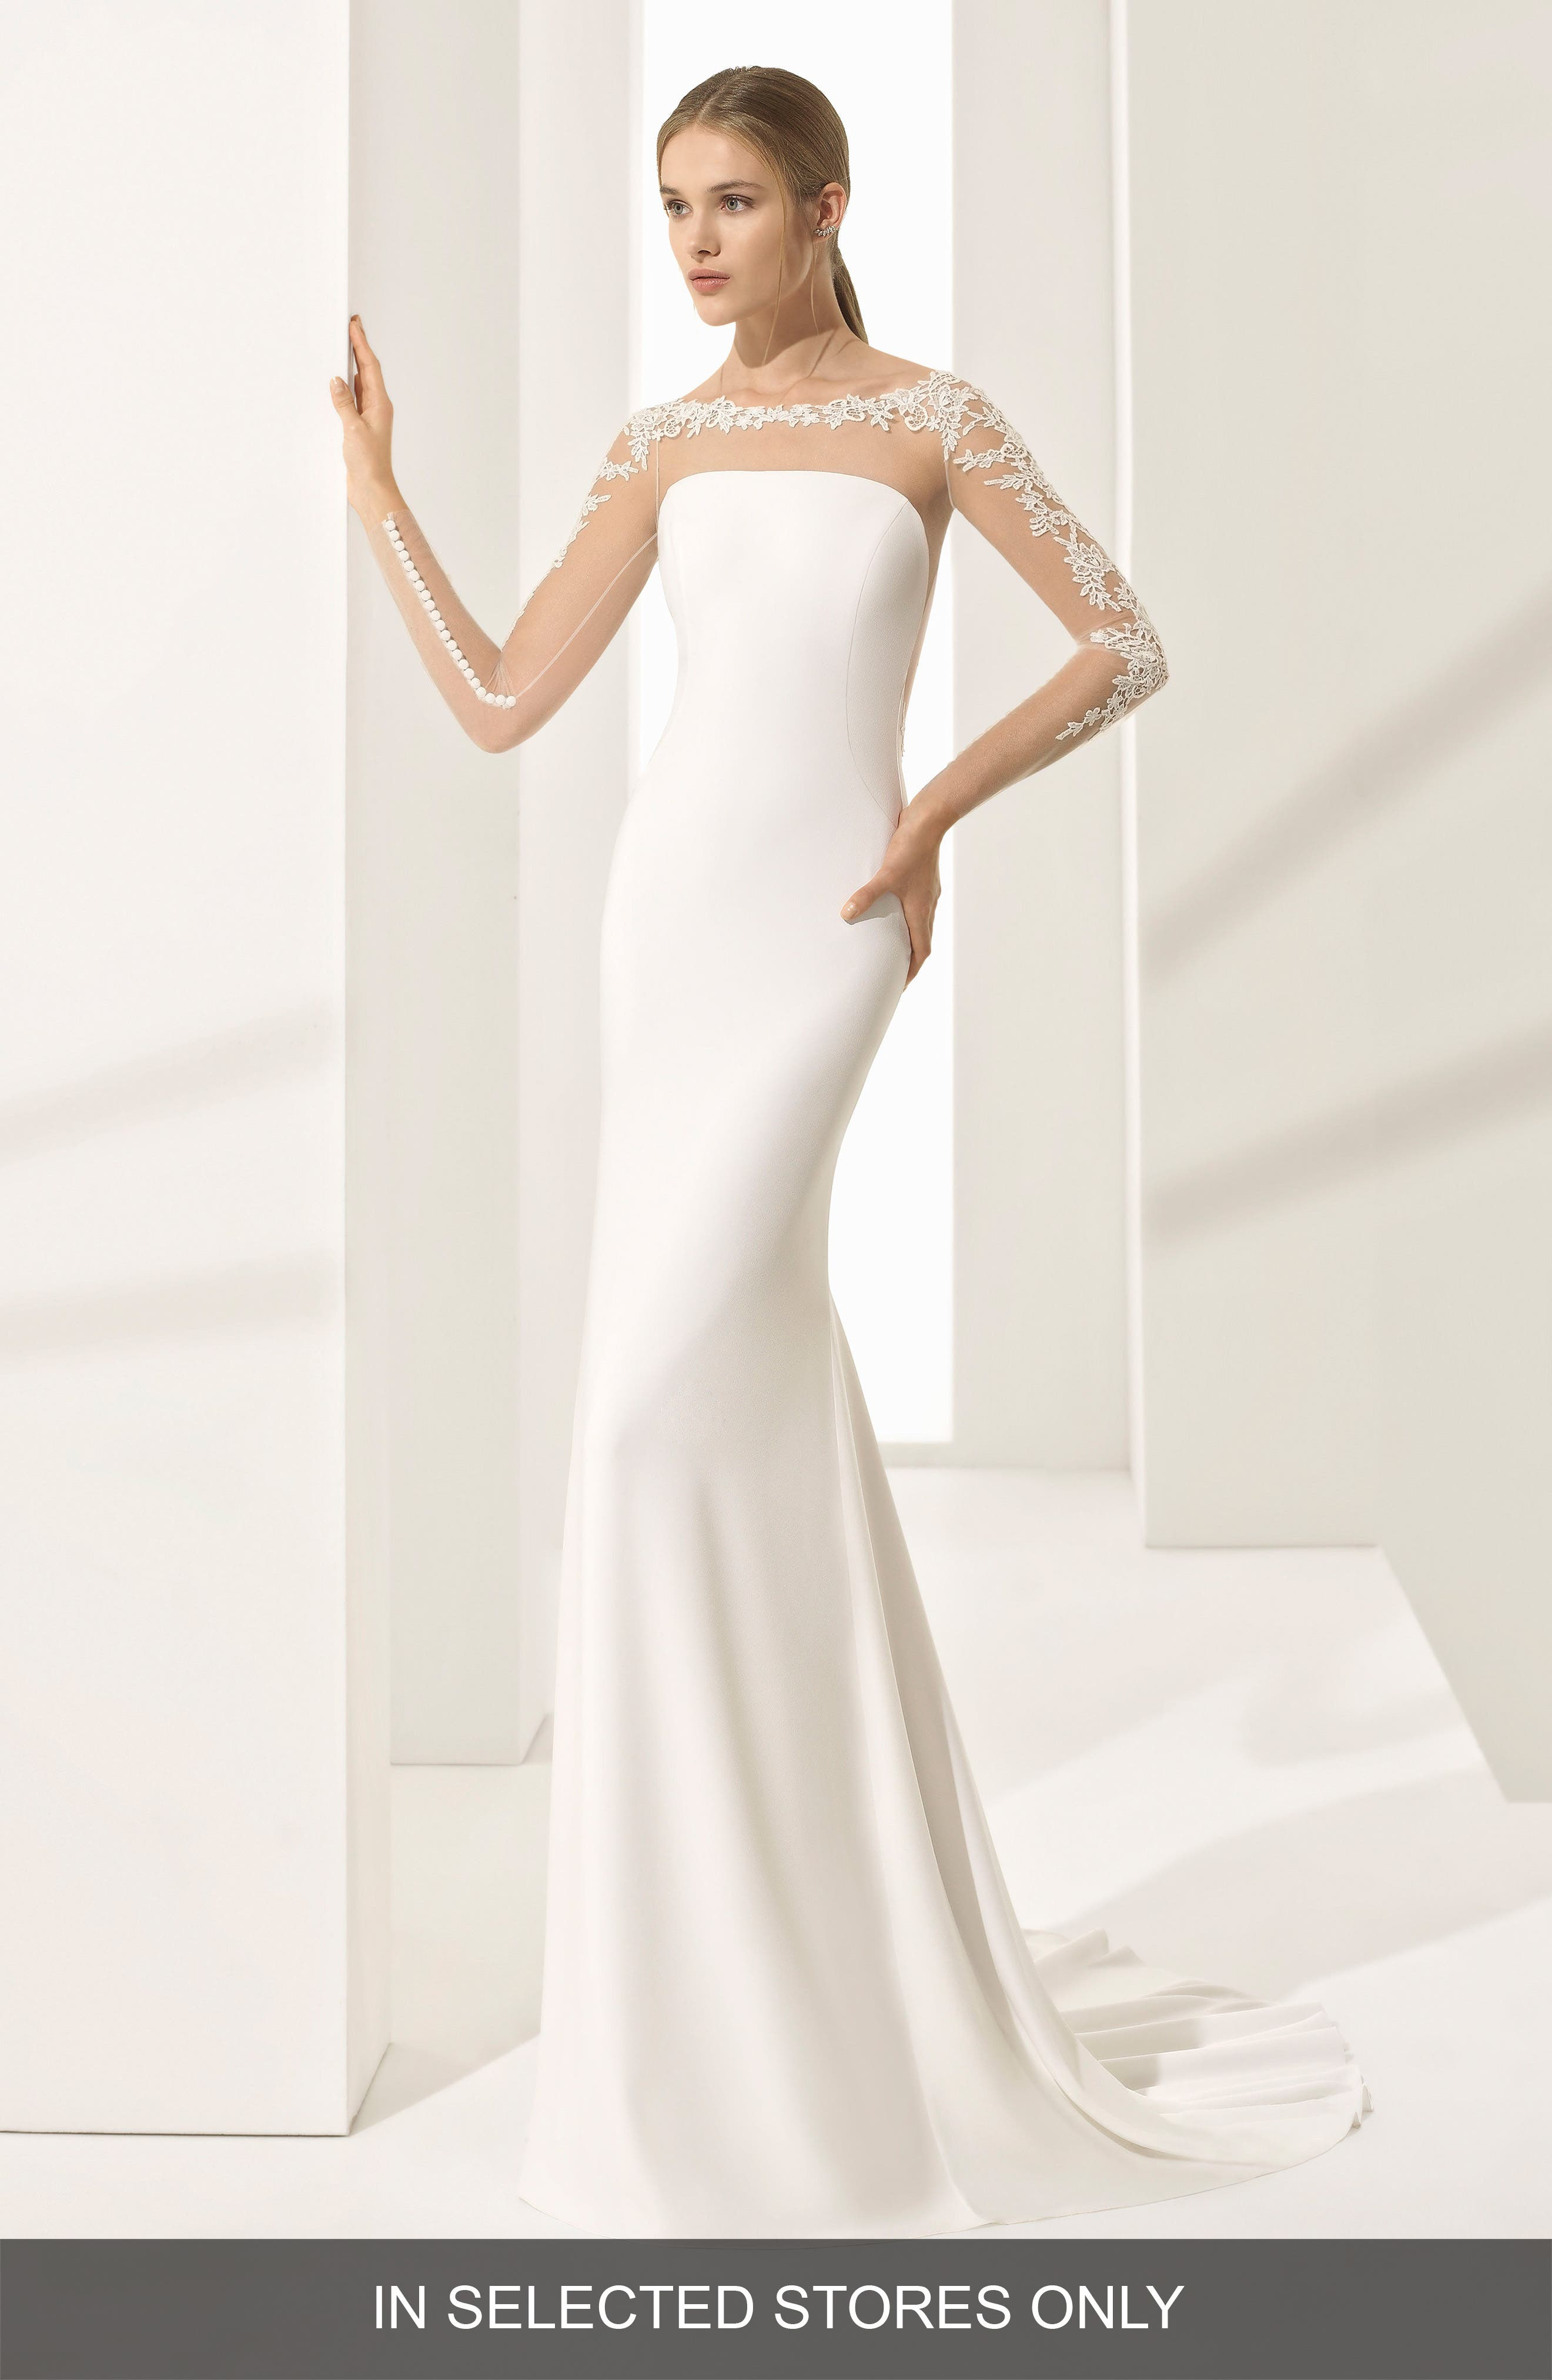 Parma Illusion Crepe Gown,                             Main thumbnail 1, color,                             Natural